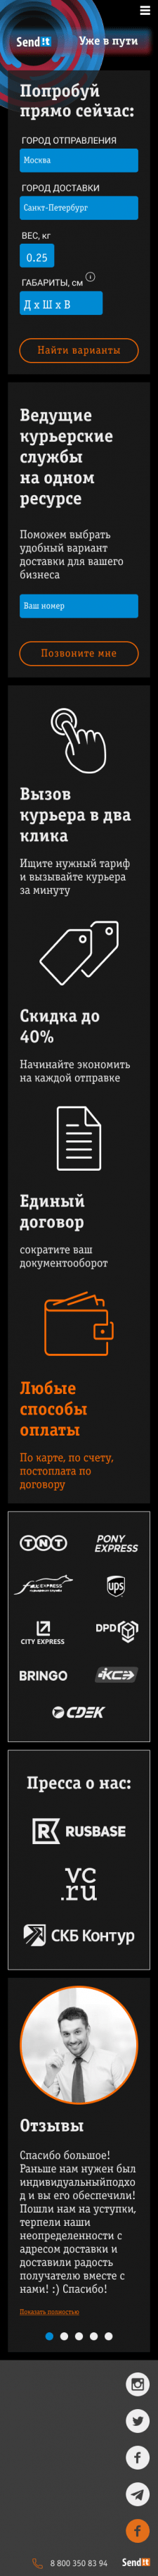 Leading Sendit (mobile version)